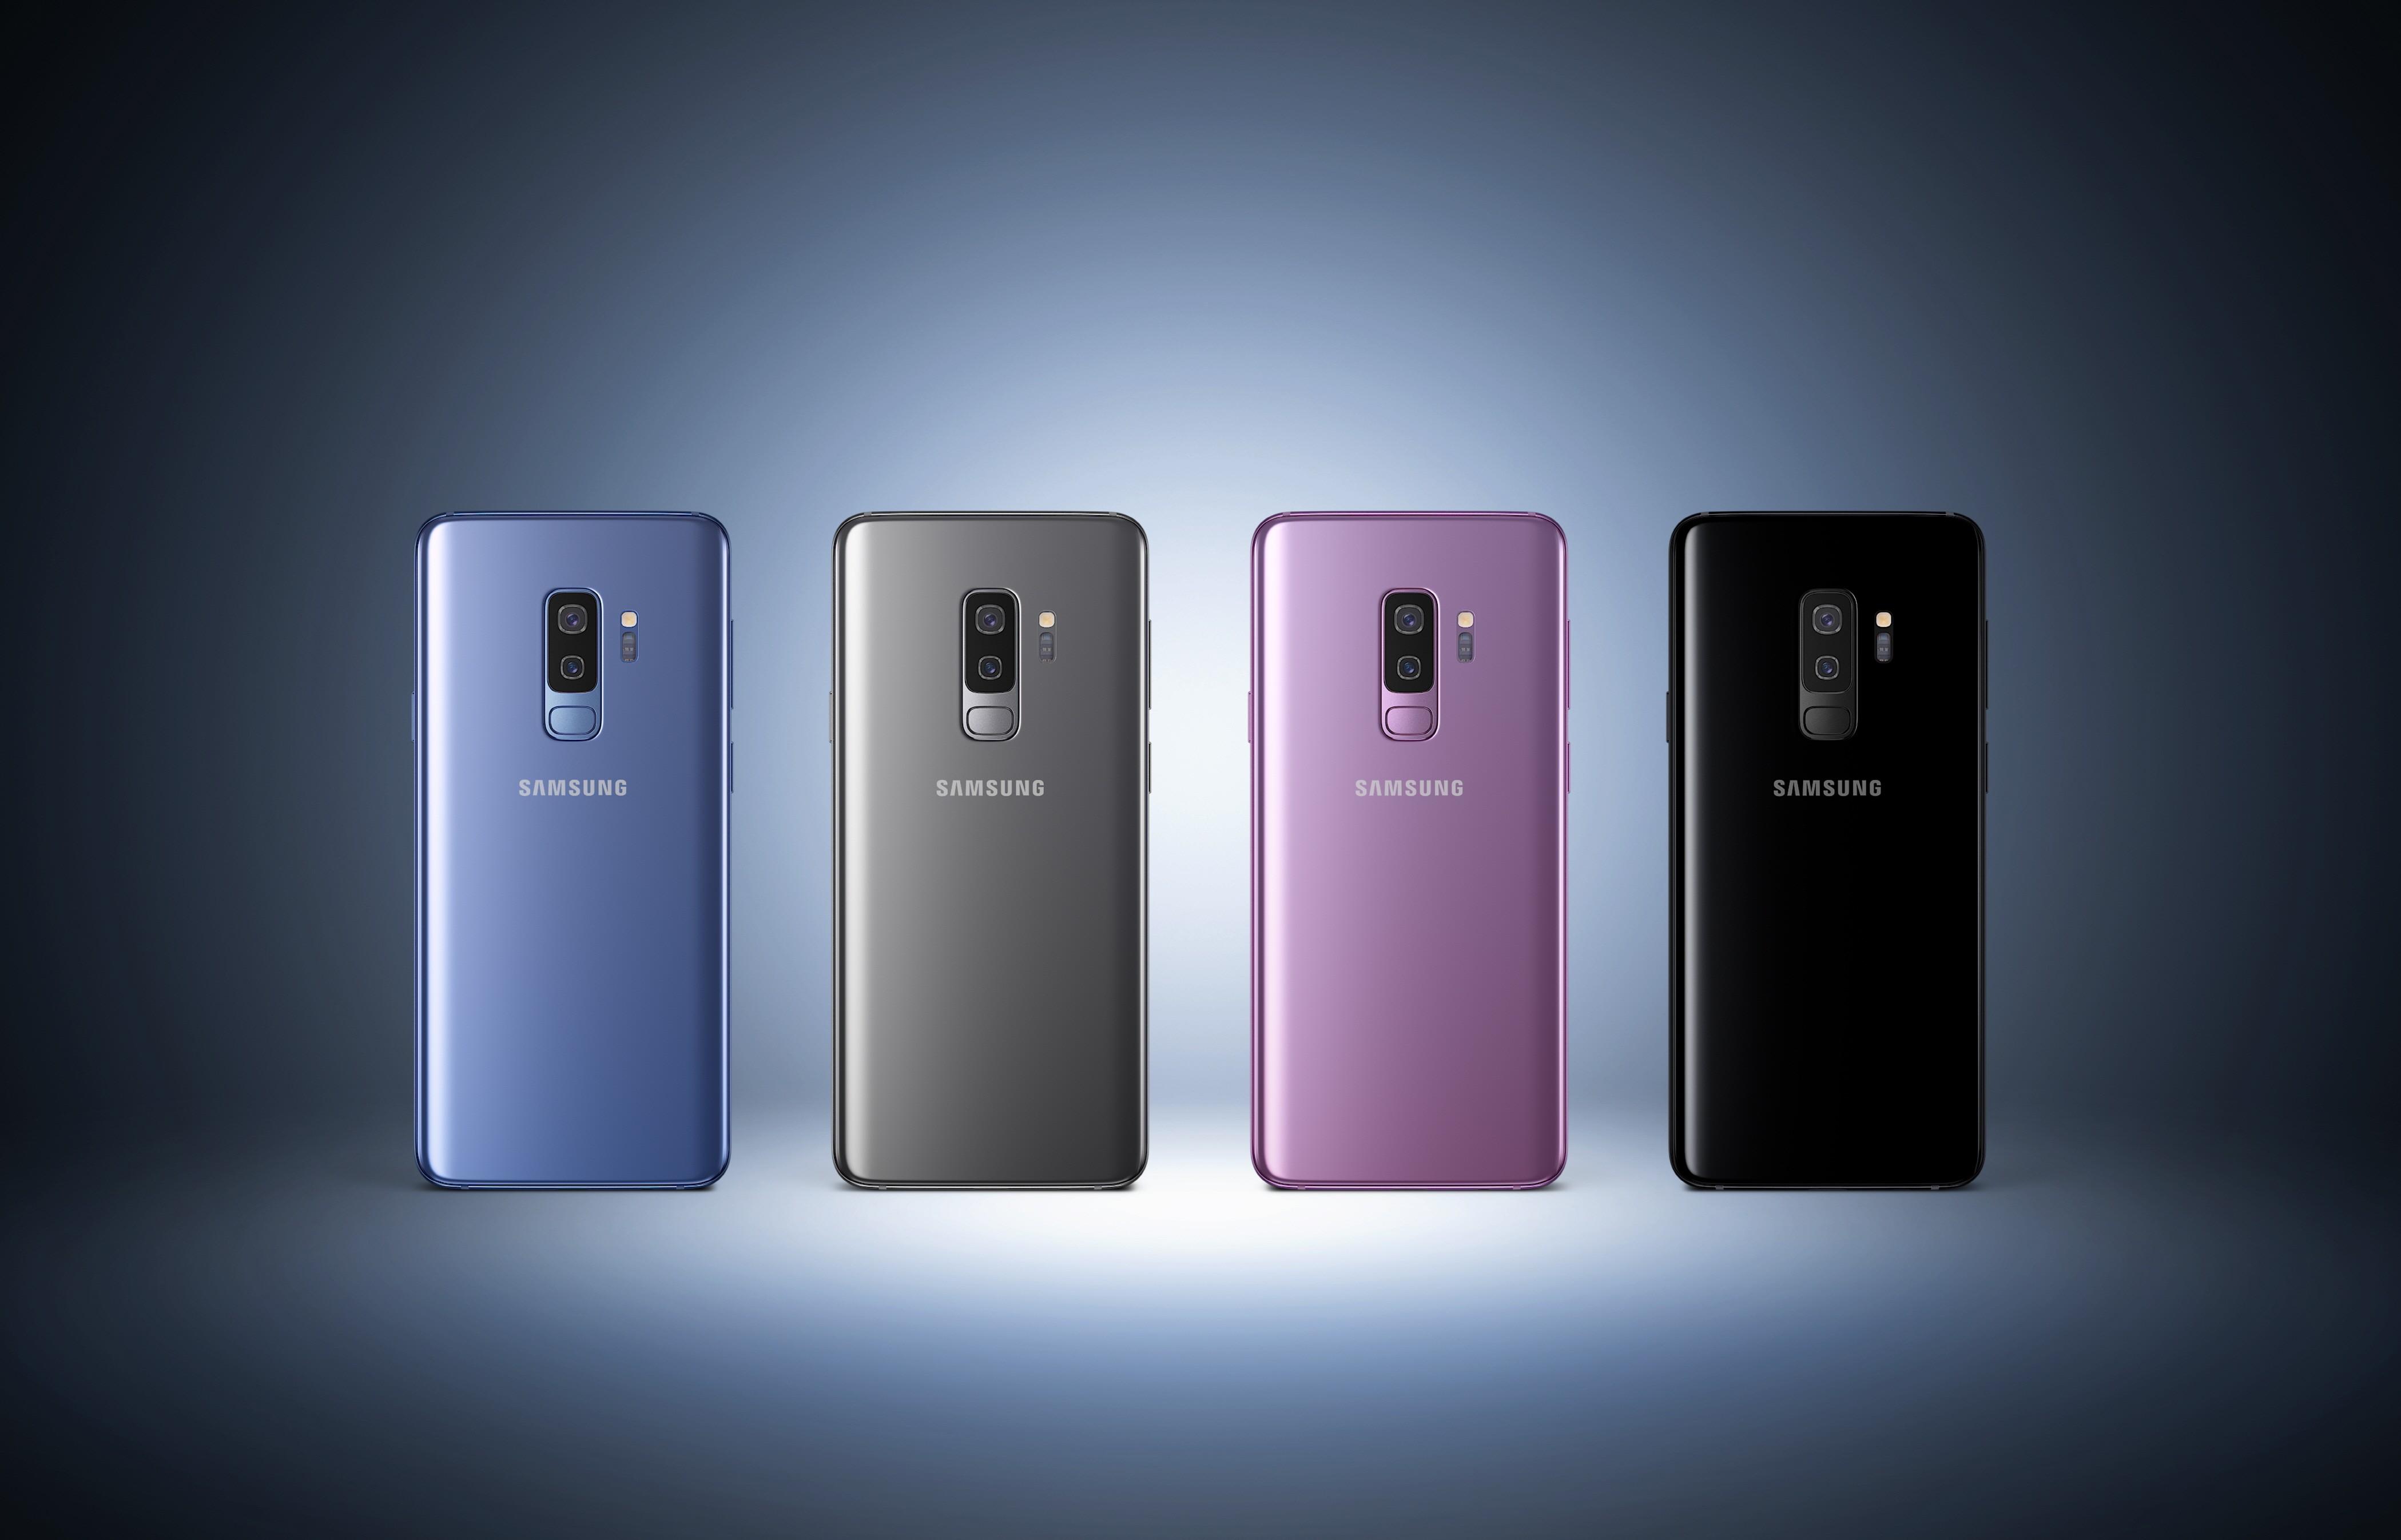 Samsung Galaxy S9 dan S9+ Menjadi Produk Flagship